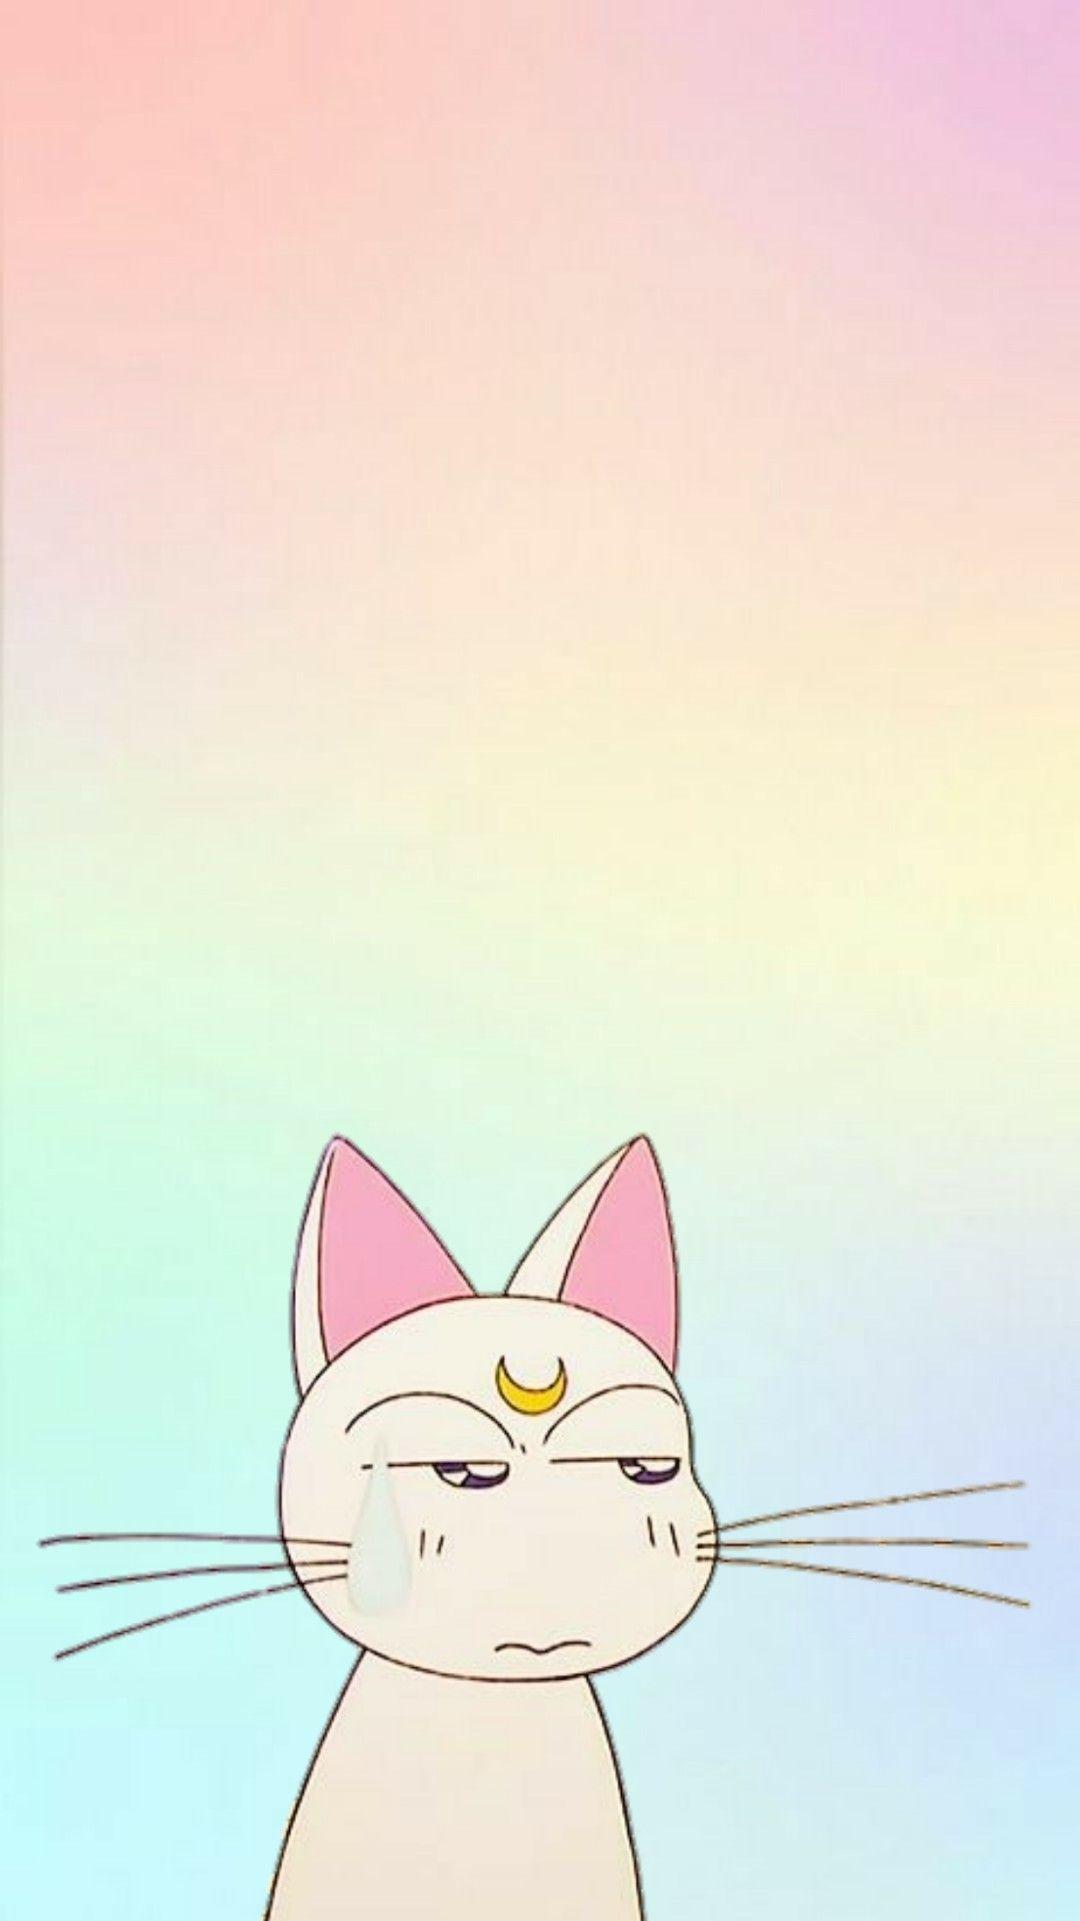 Pinterest Xioohh Sailor Moon Wallpaper Sailor Moon Aesthetic Sailor Moon Background